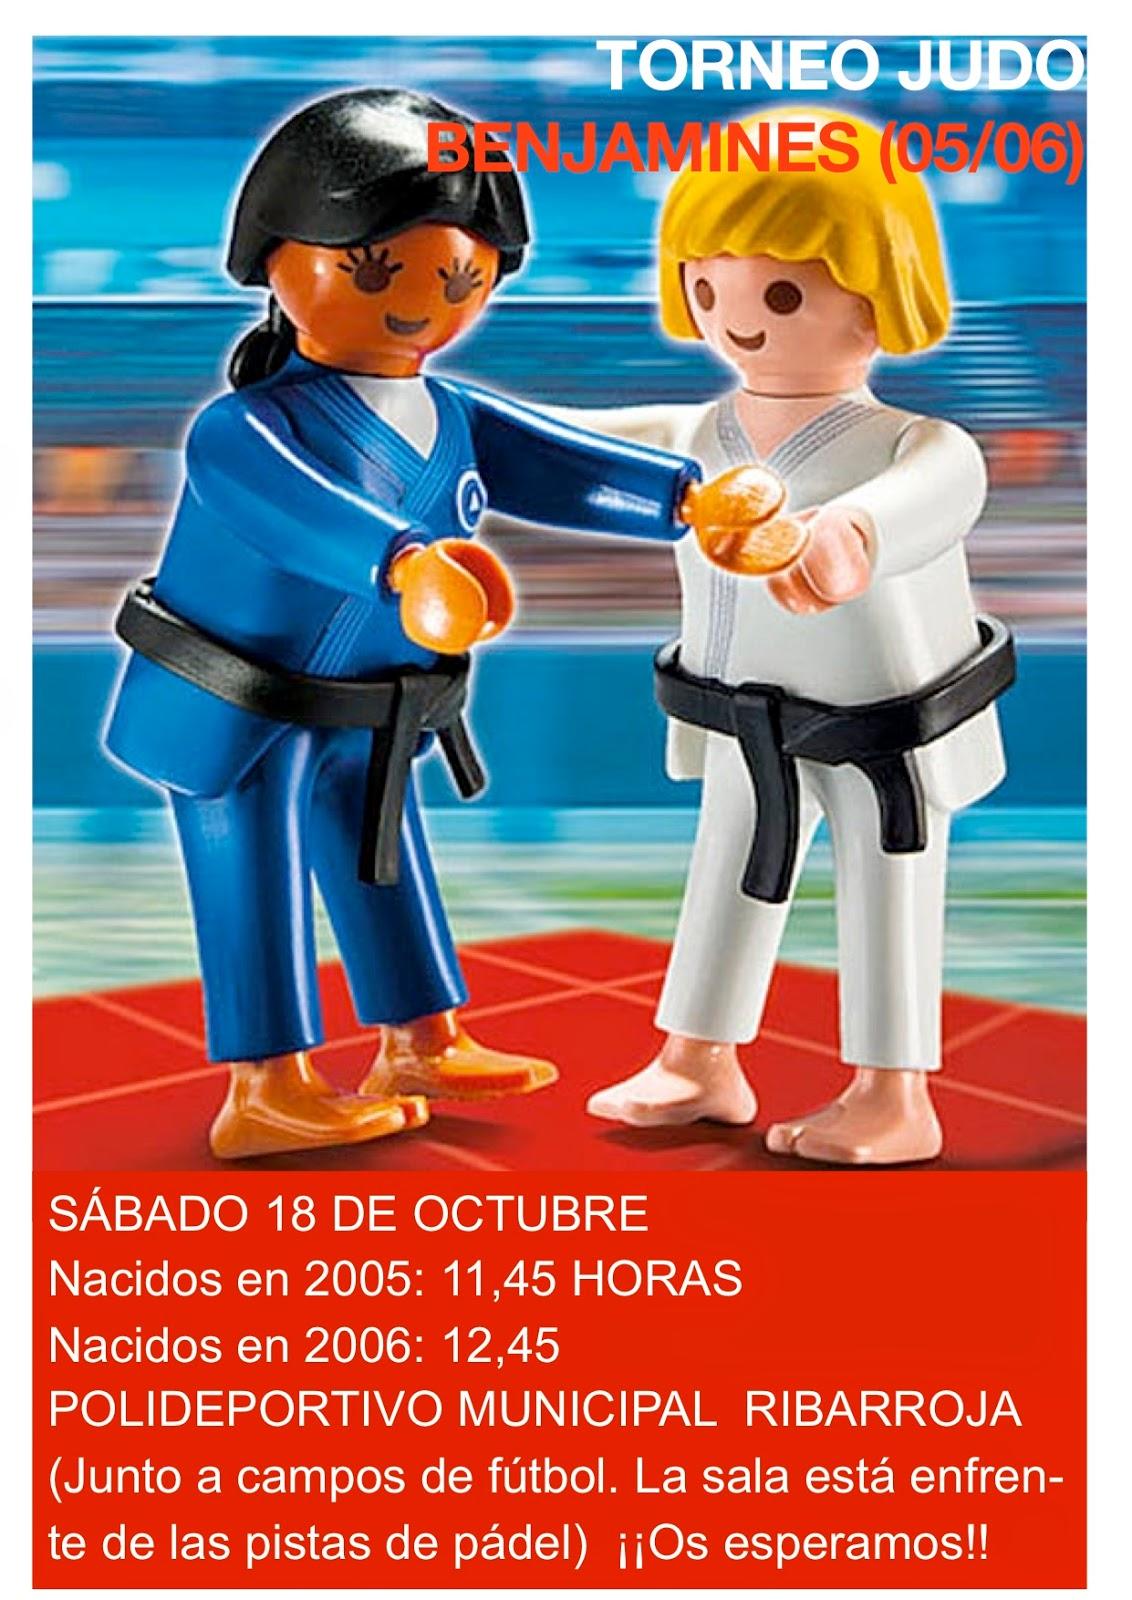 http://www.judokan.com/02opc/liga/2014/05jor.pdf